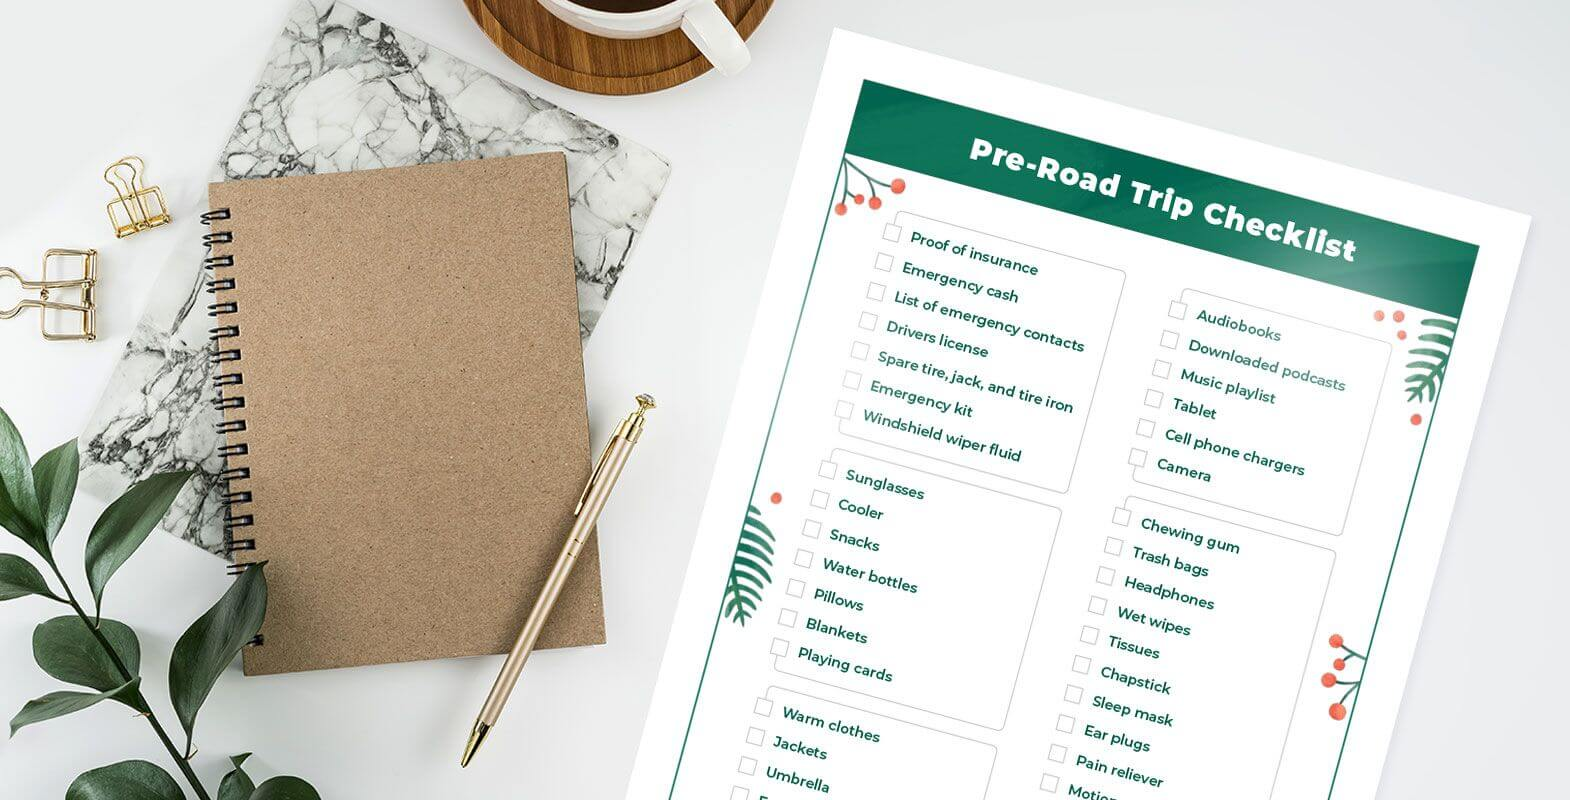 Pre-Road Trip Checklist